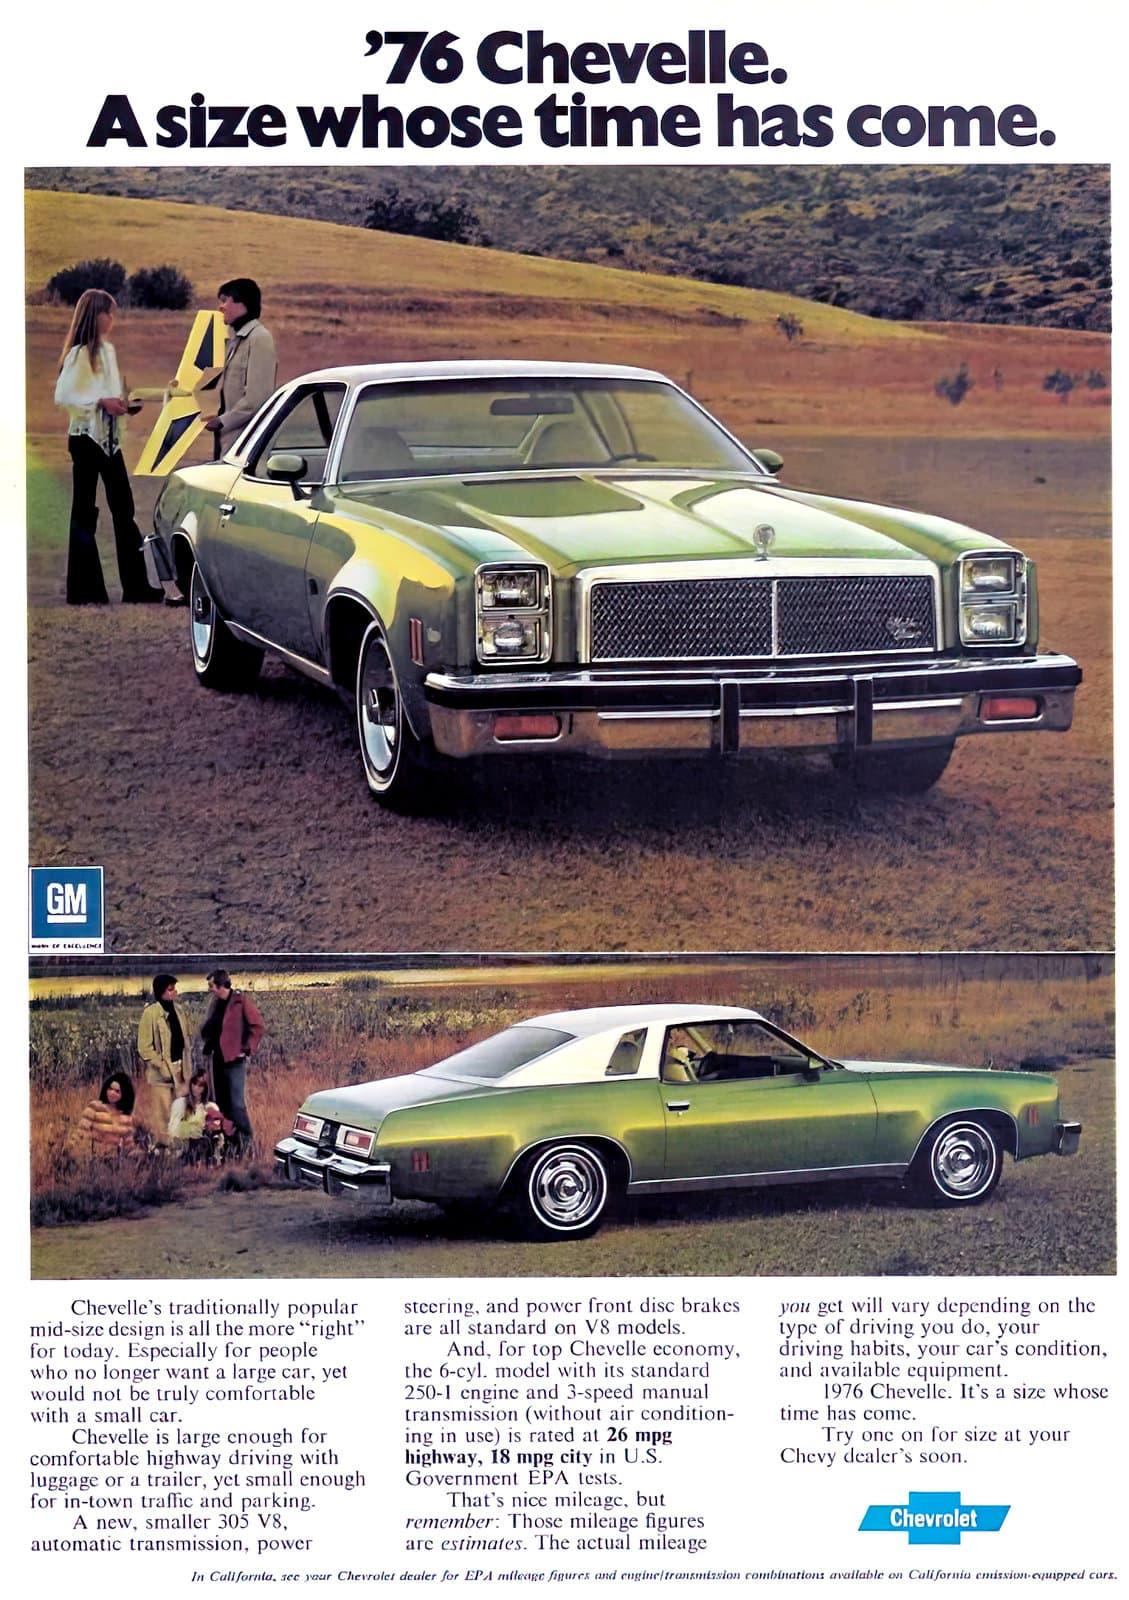 1976 Chevy Chevelle